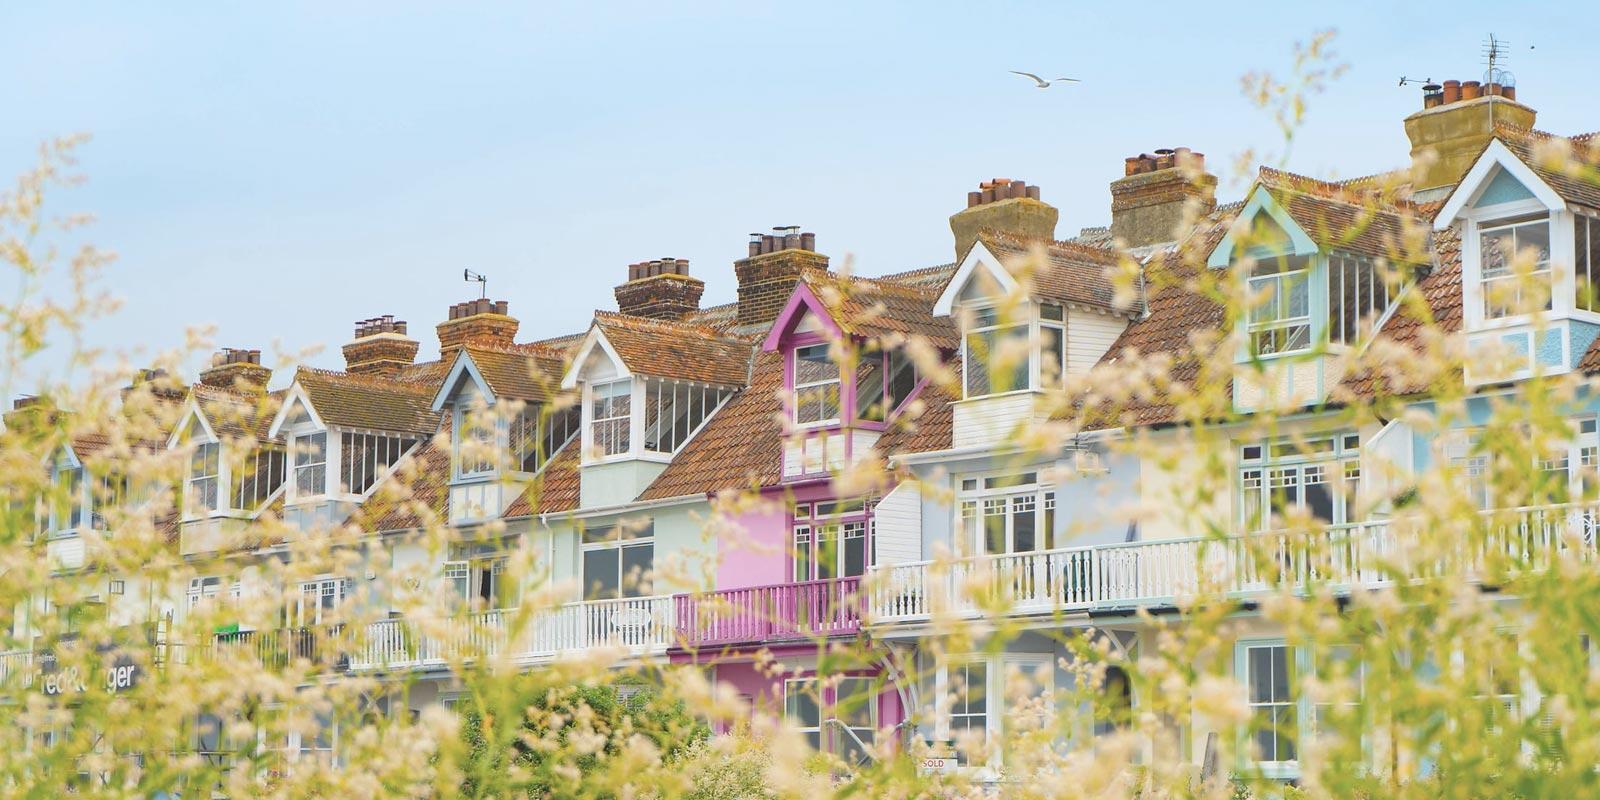 Great British Seaside: Whitstable